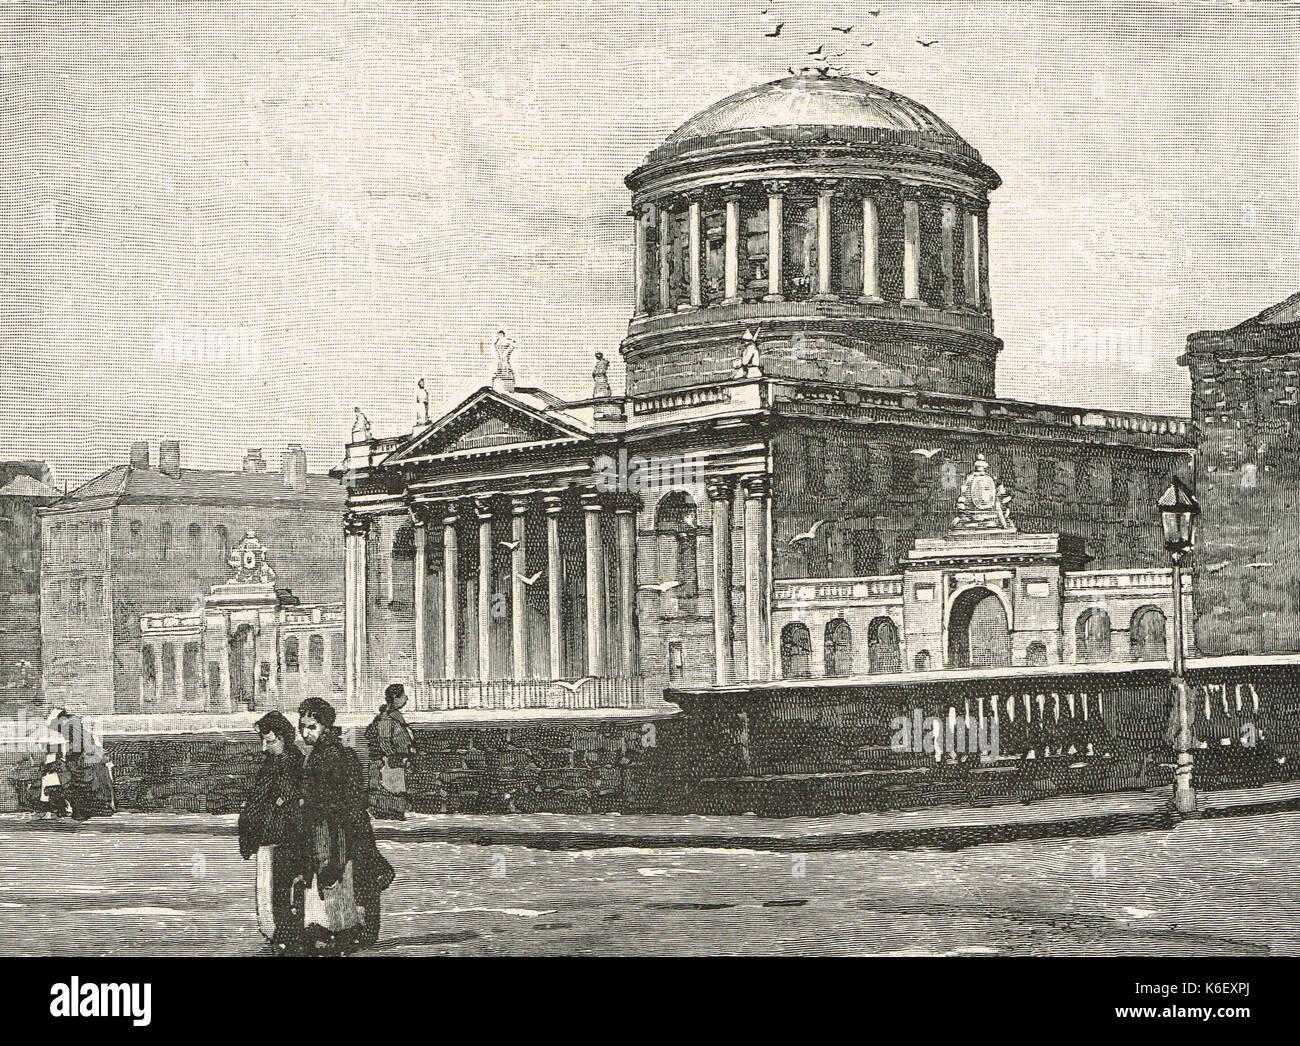 The Four Courts, Dublin, circa 1844 - Stock Image